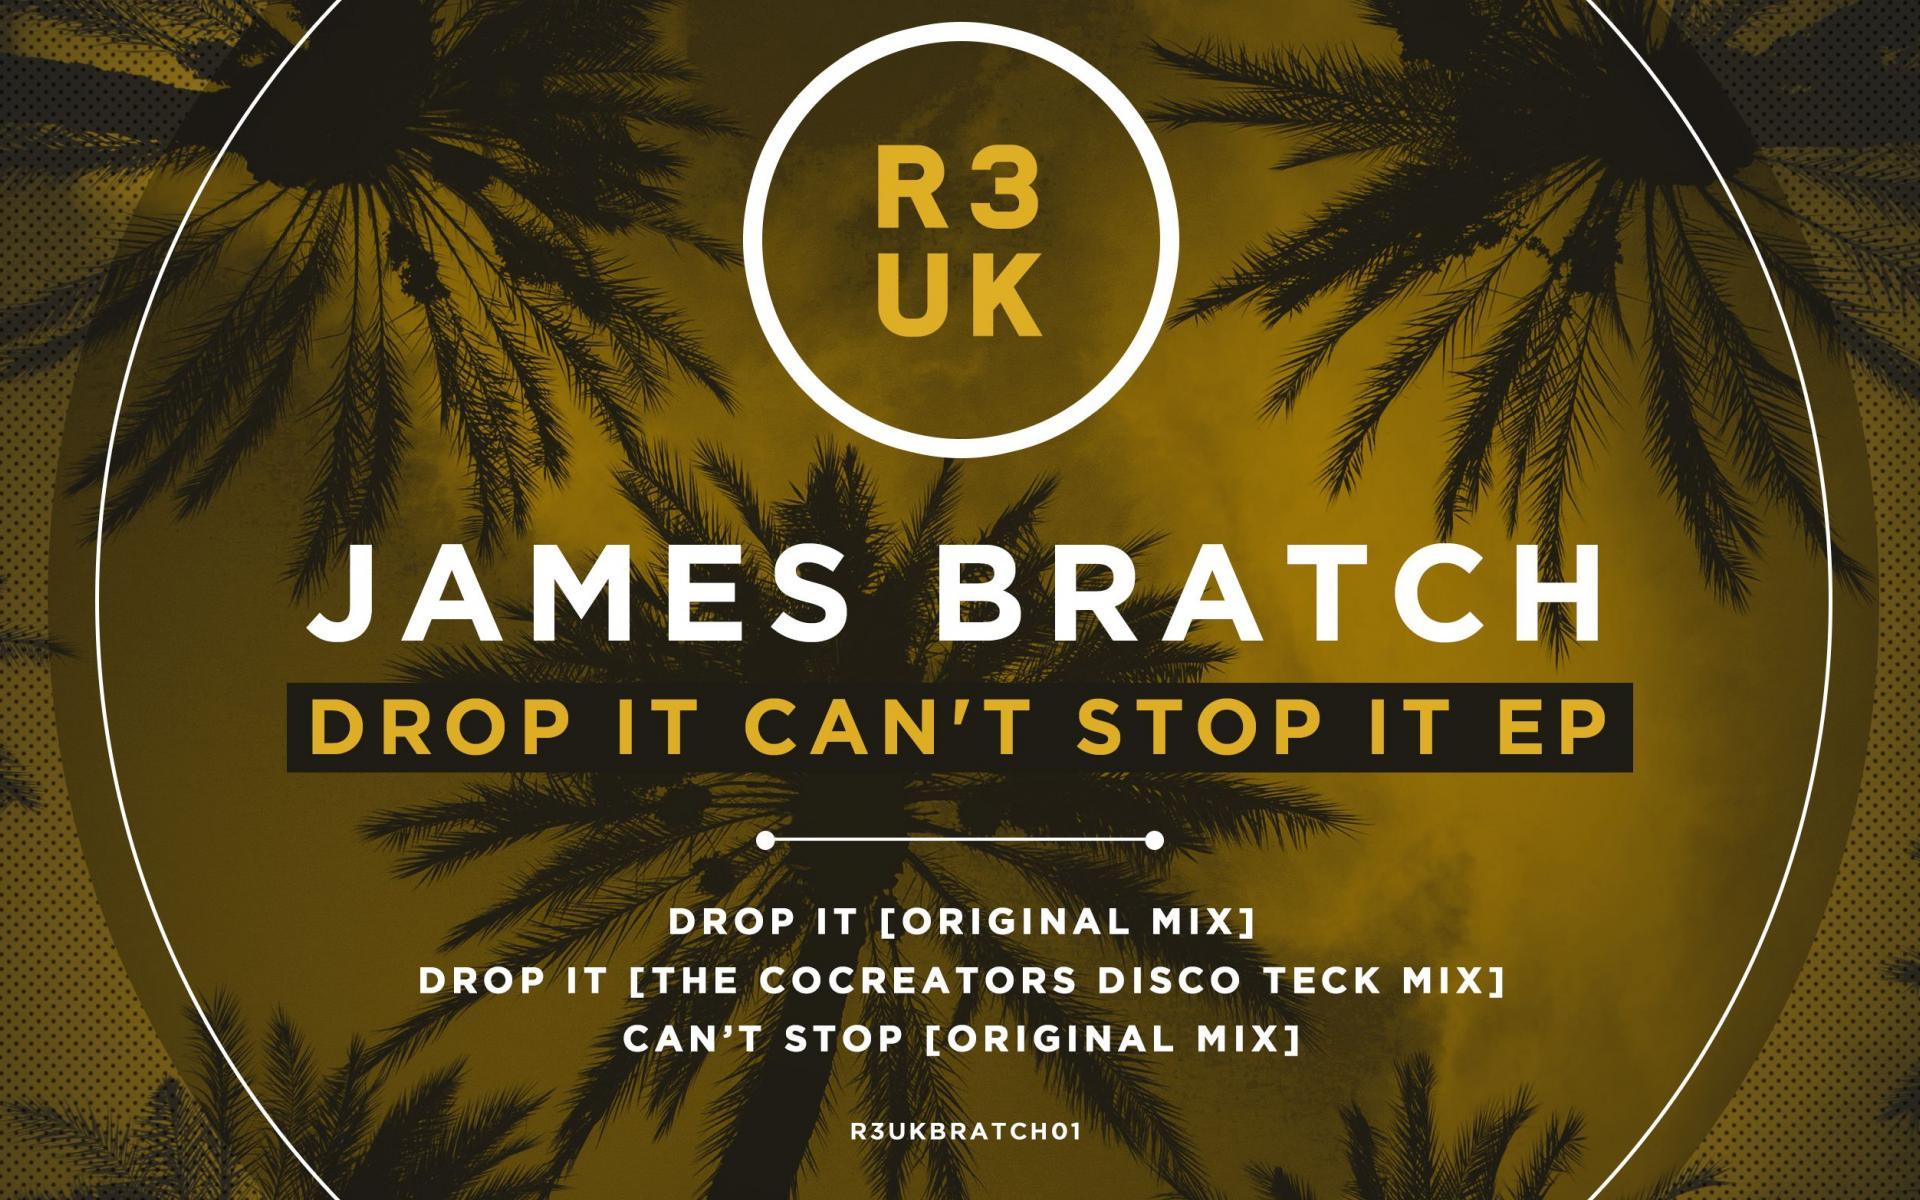 James Bratch - Drop It Can't Stop It Ep (The CoCreators Disco Teck Mix)